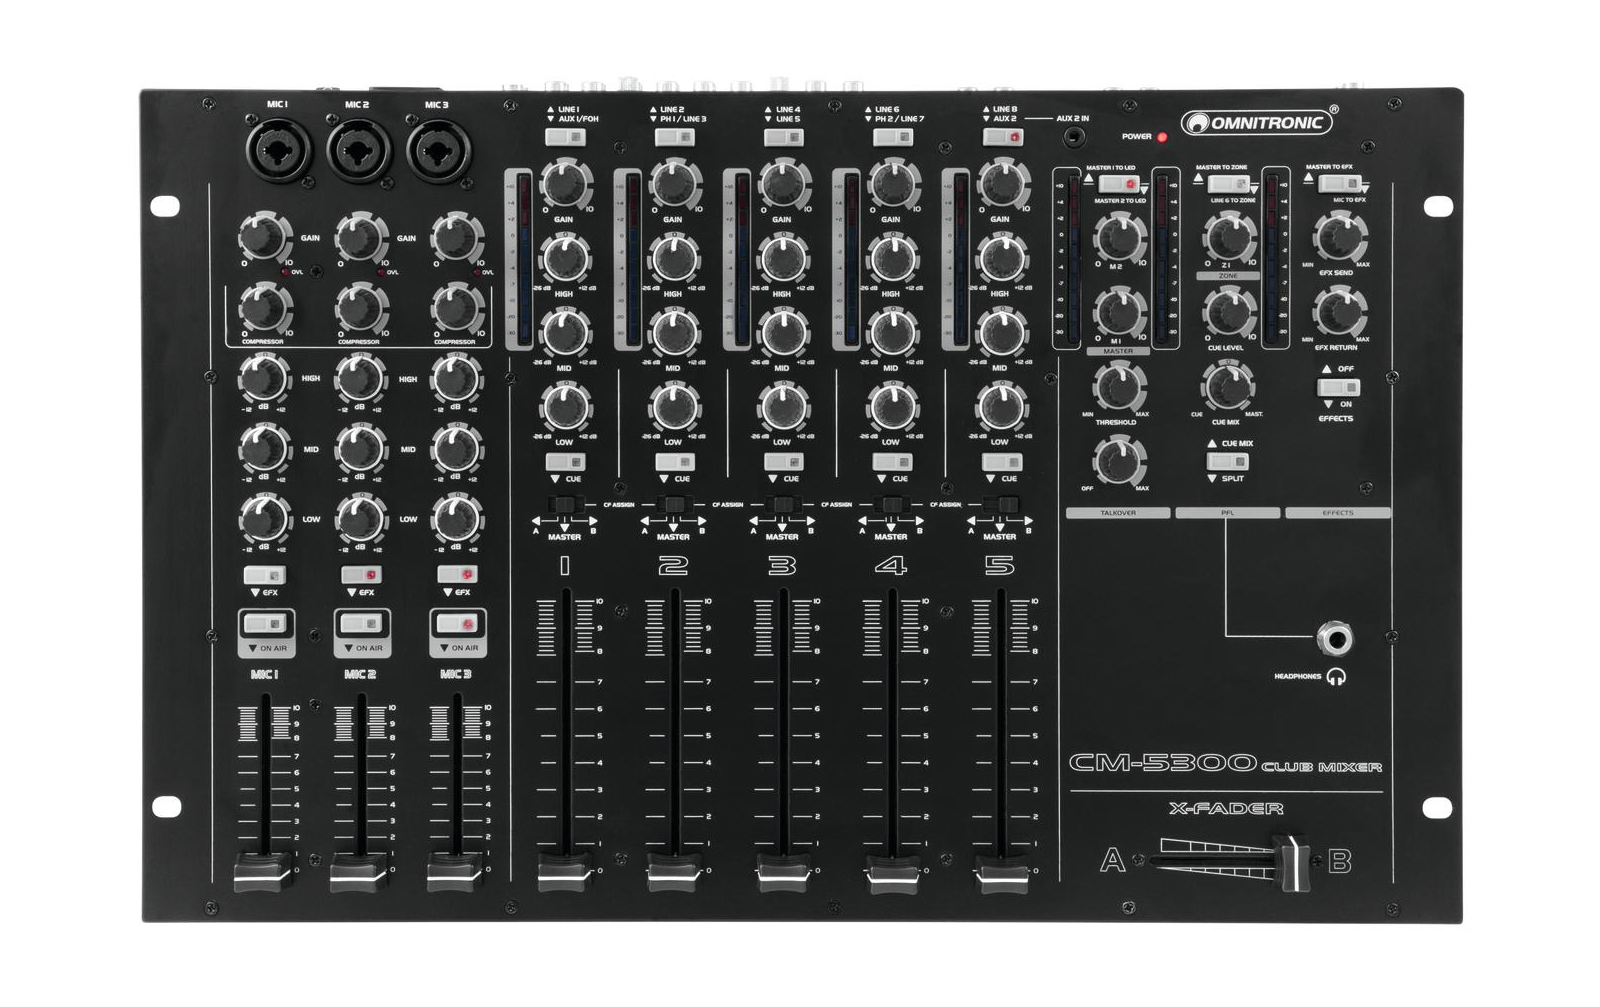 omnitronic-cm-5300-club-mixer